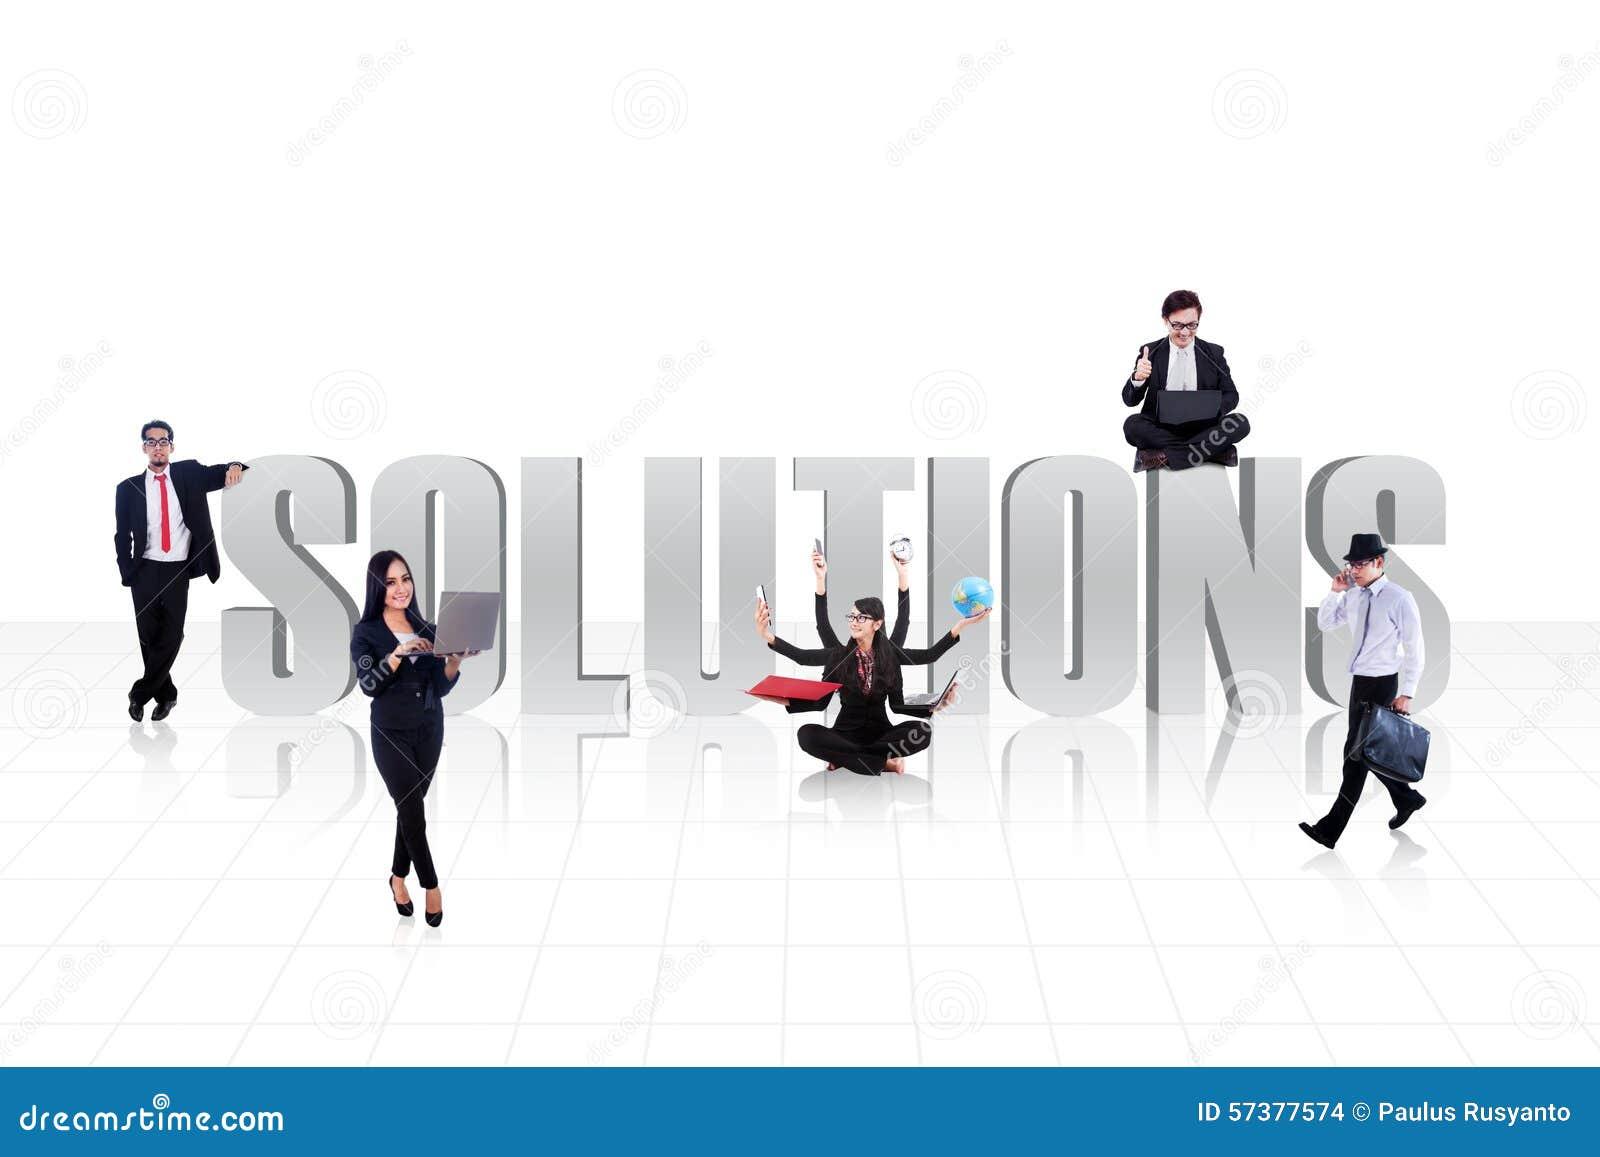 Bedrijfsoplossingen op wit